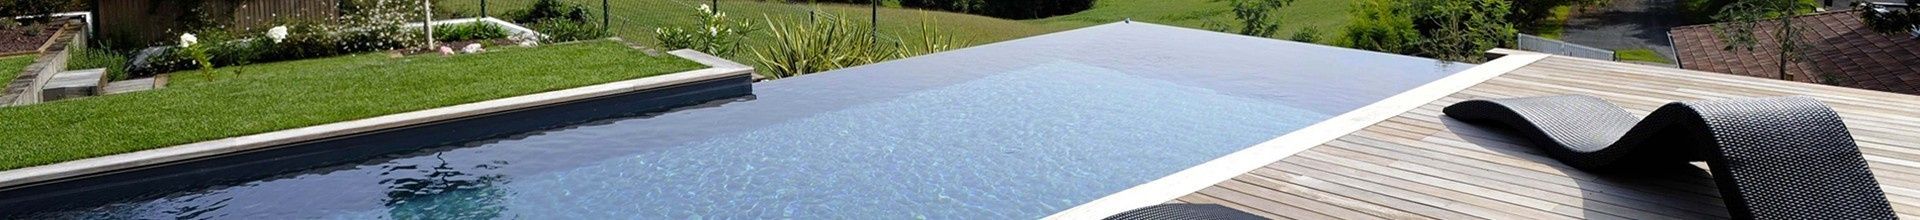 Direct usine, piscine coque prix Tarn-et-Garonne